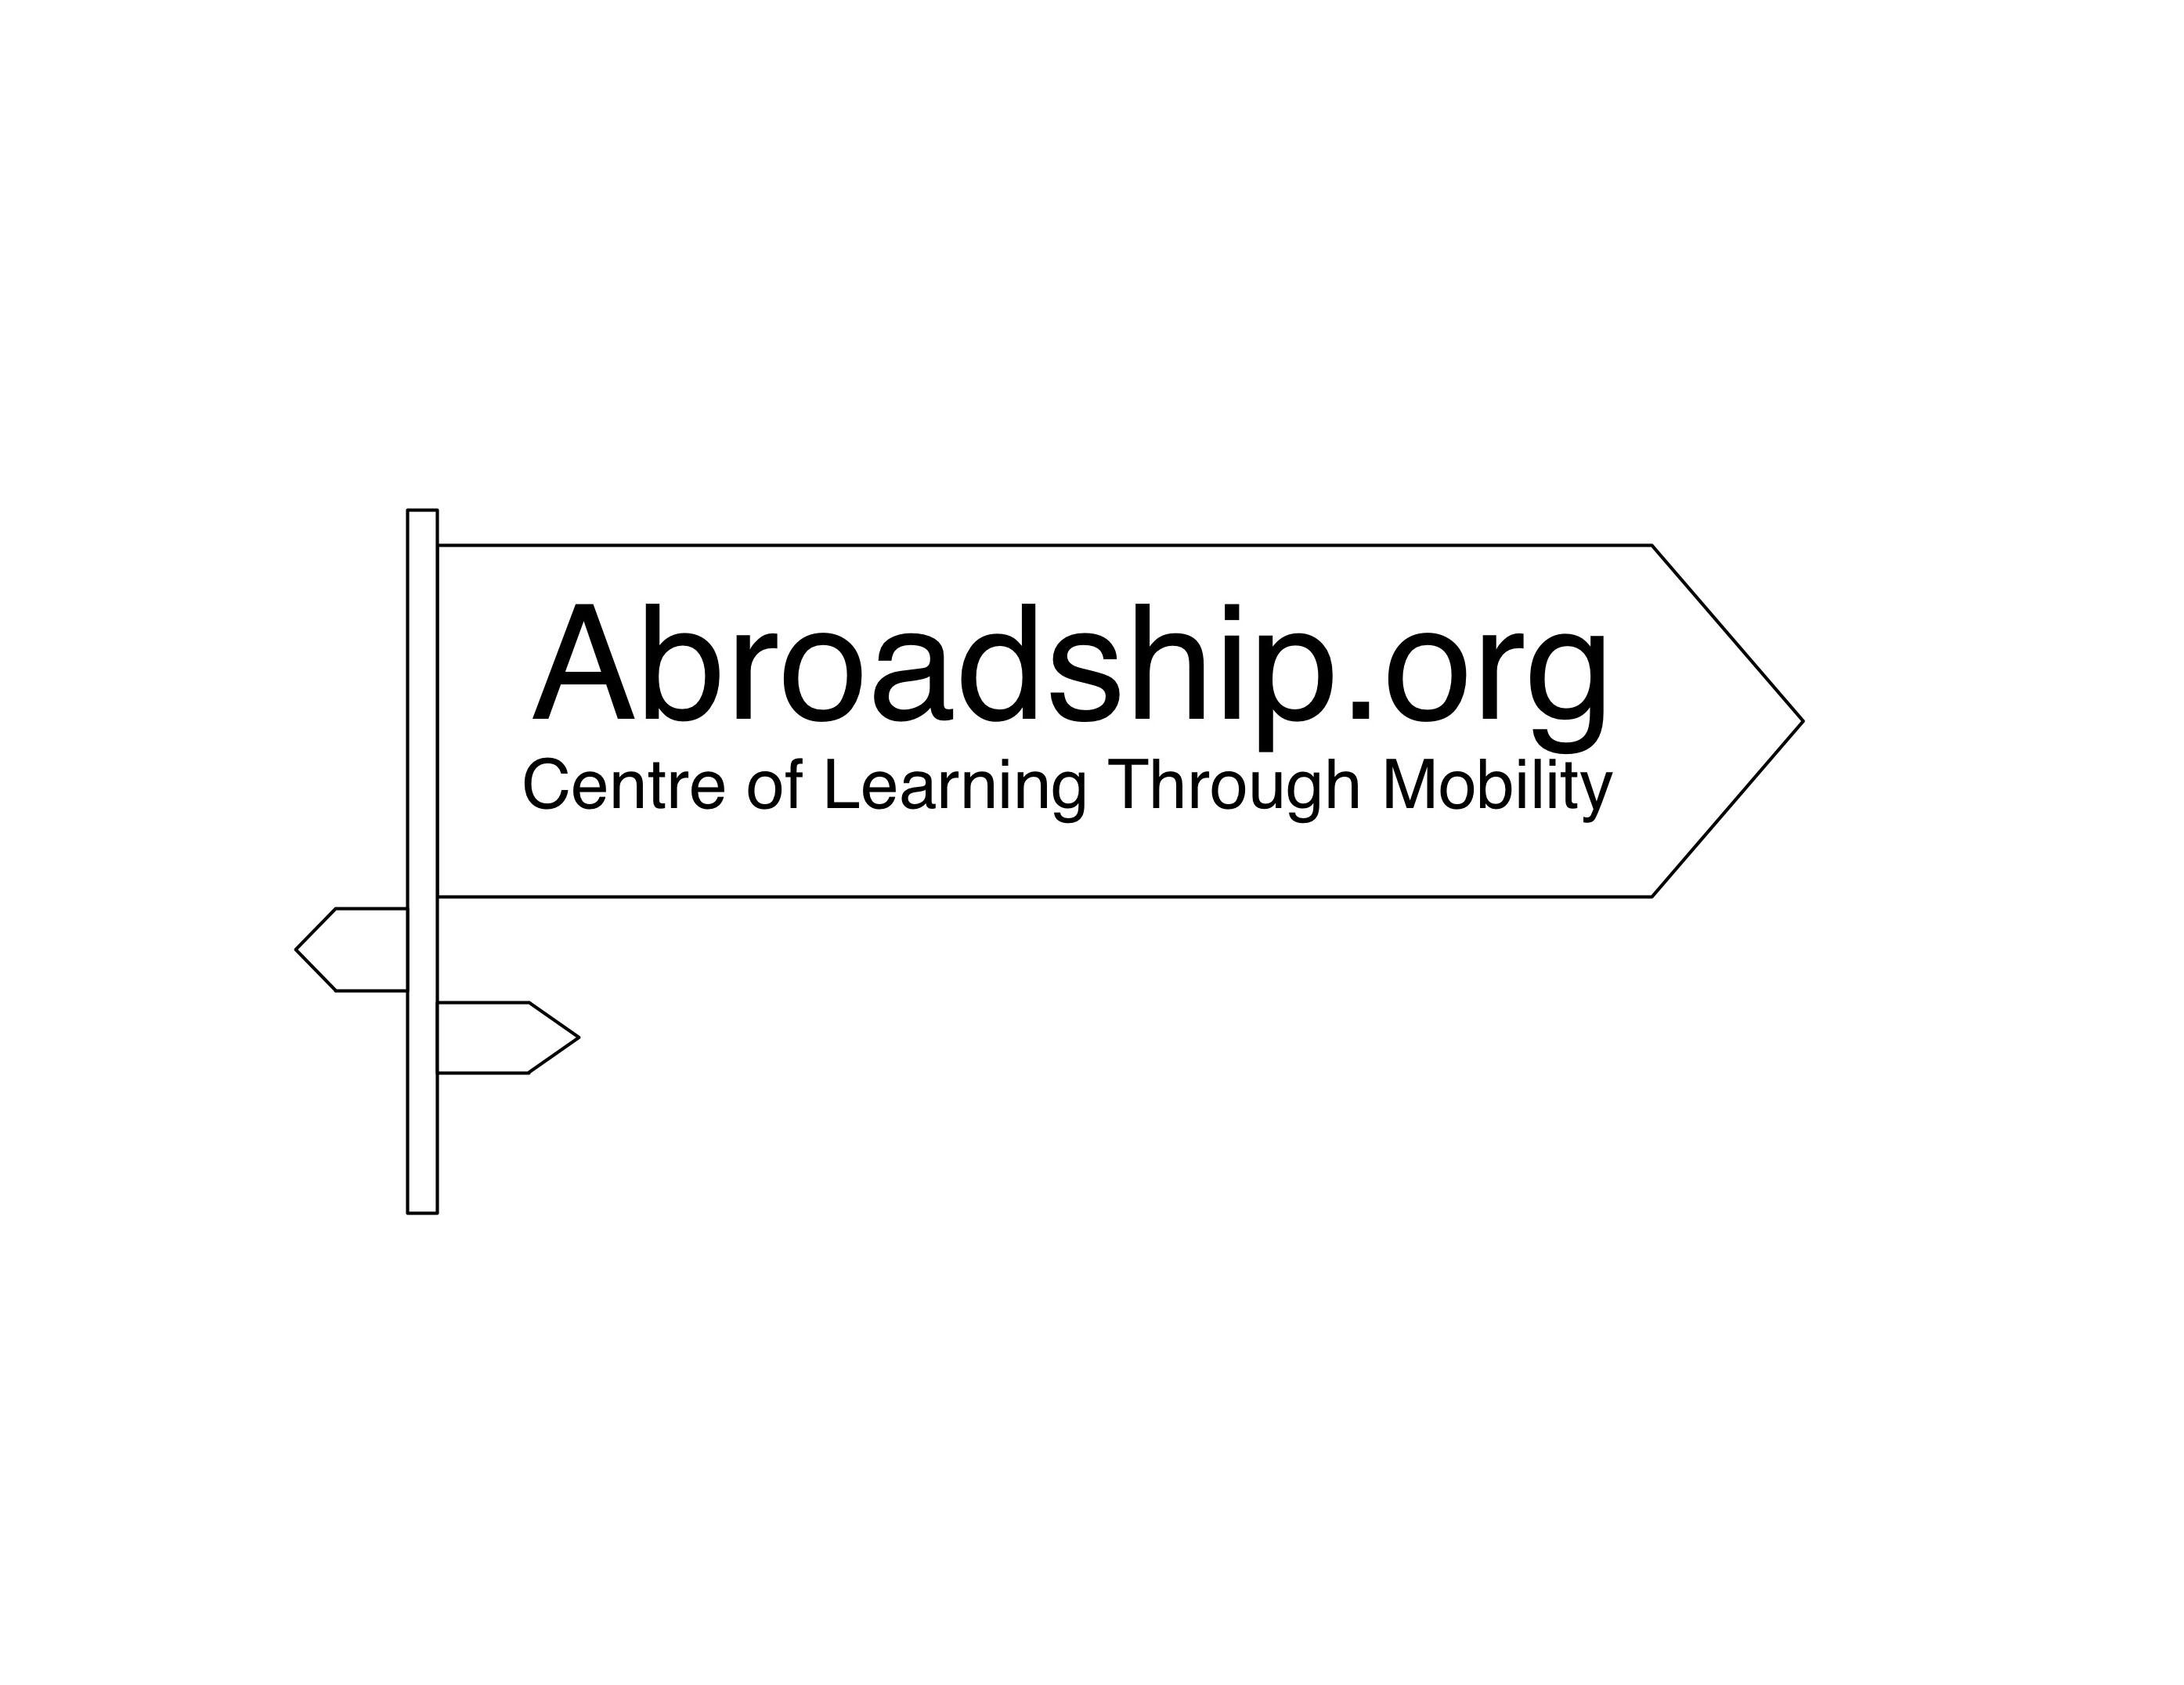 abroadship.org